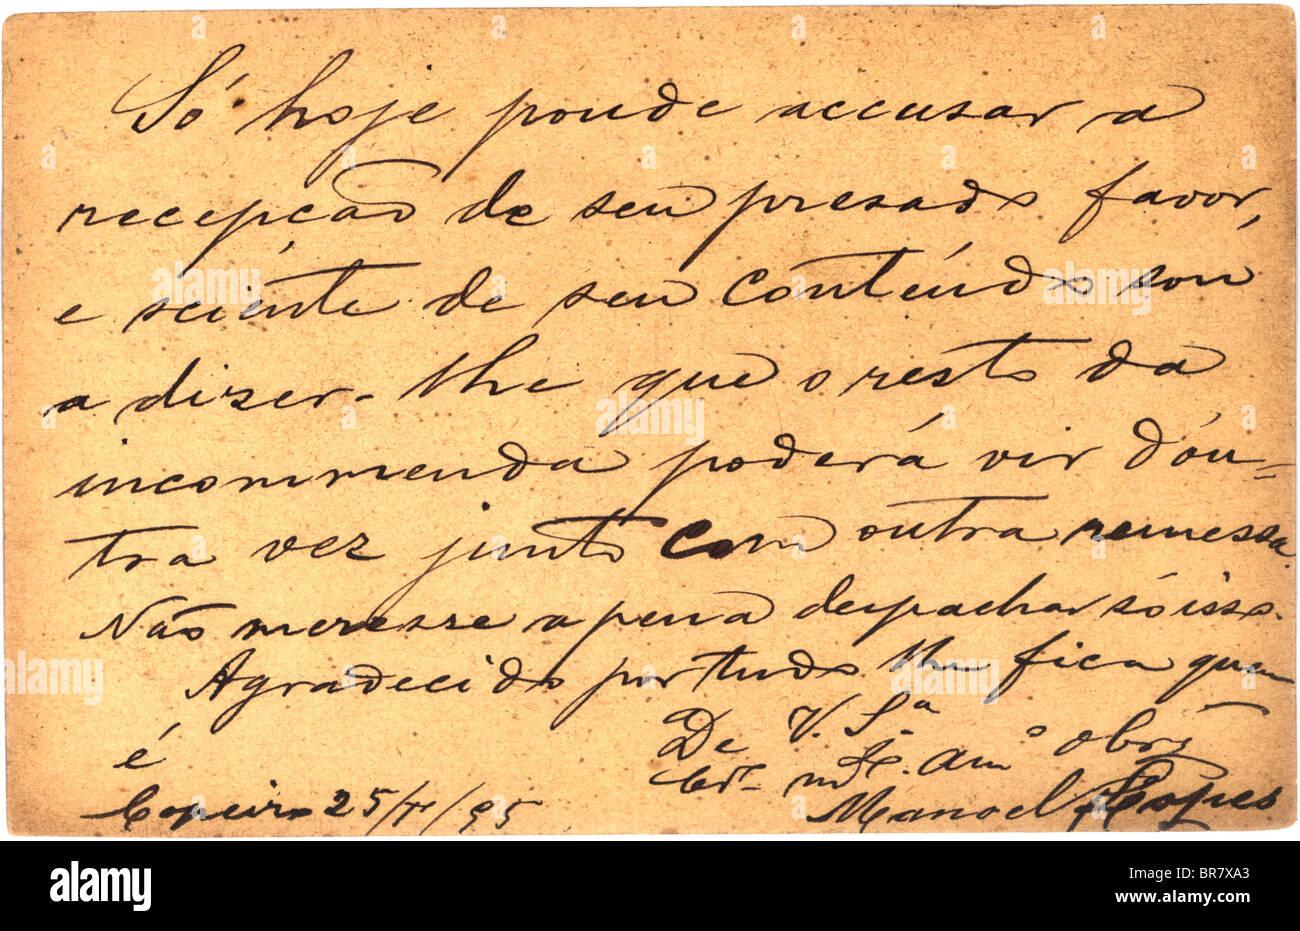 Vintage postcard with script writing, 1895 Stock Photo: 31521787 - Alamy